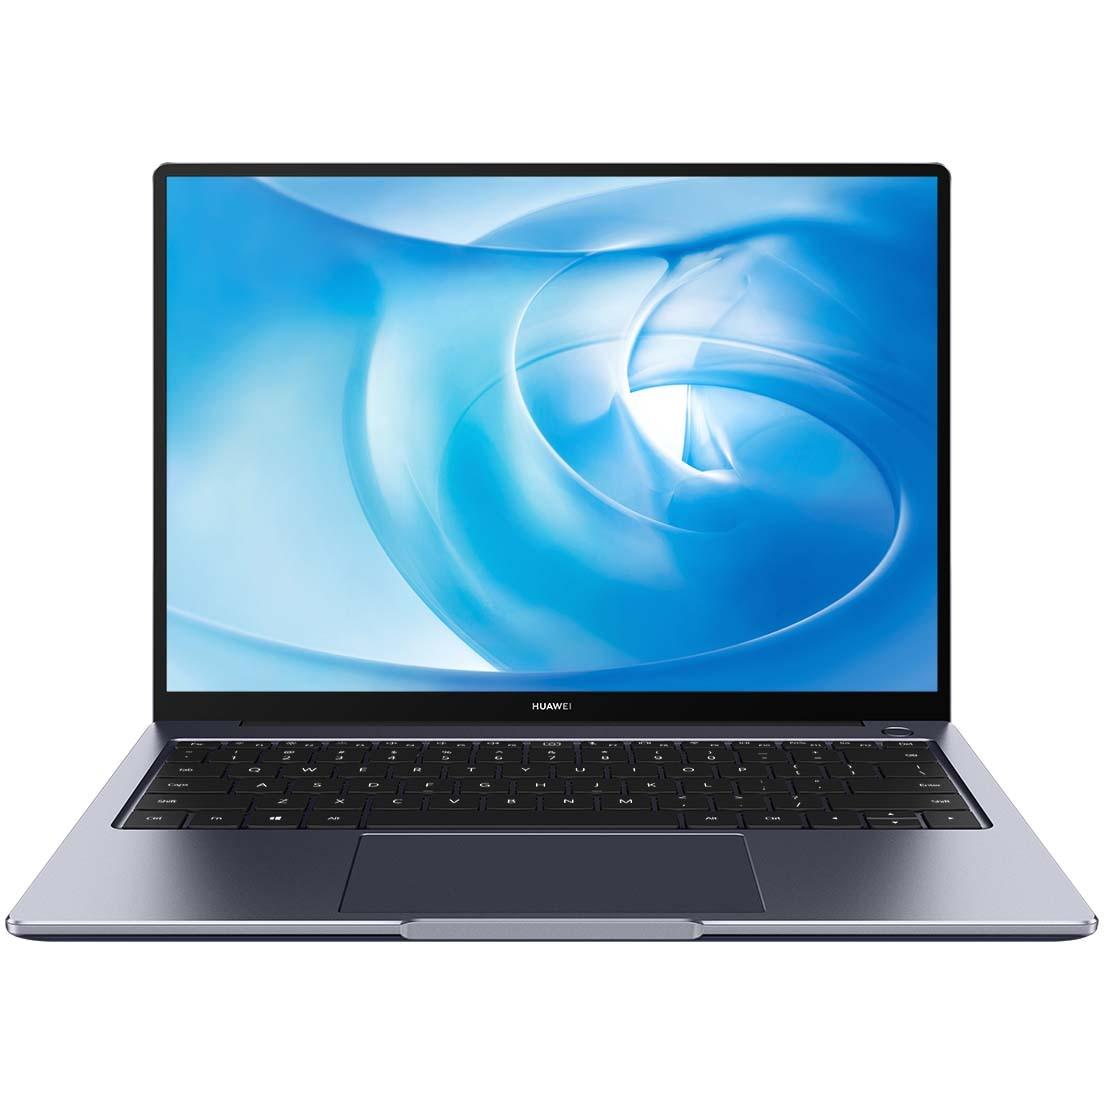 "Fotografie Laptop ultraportabil Huawei MateBook 14 cu procesor AMD Ryzen 5 4600H pana la 4.00 GHz, 14"", 2K, 8GB, 256GB SSD, AMD Radeon Graphics, Windows 10 Home, Gray"